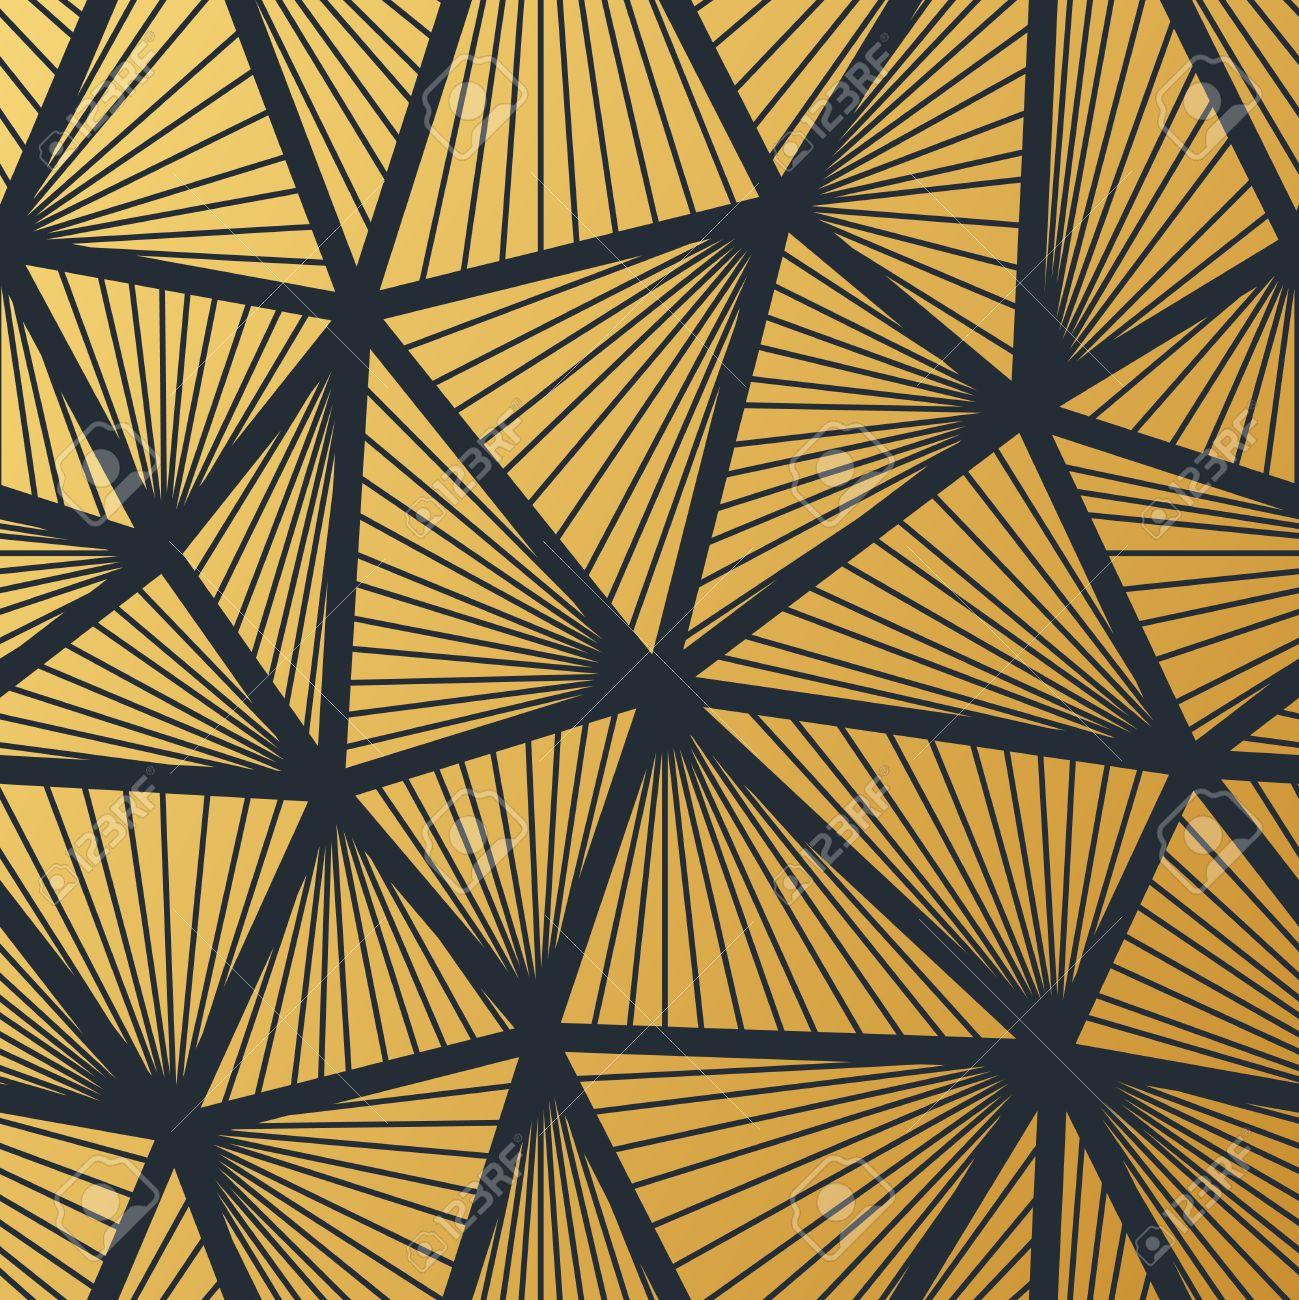 charming Art Deco Geometric Wallpaper Part - 2: Art Deco seamless vintage wallpaper pattern. Geometric decorative  background. Stock Vector - 68165160